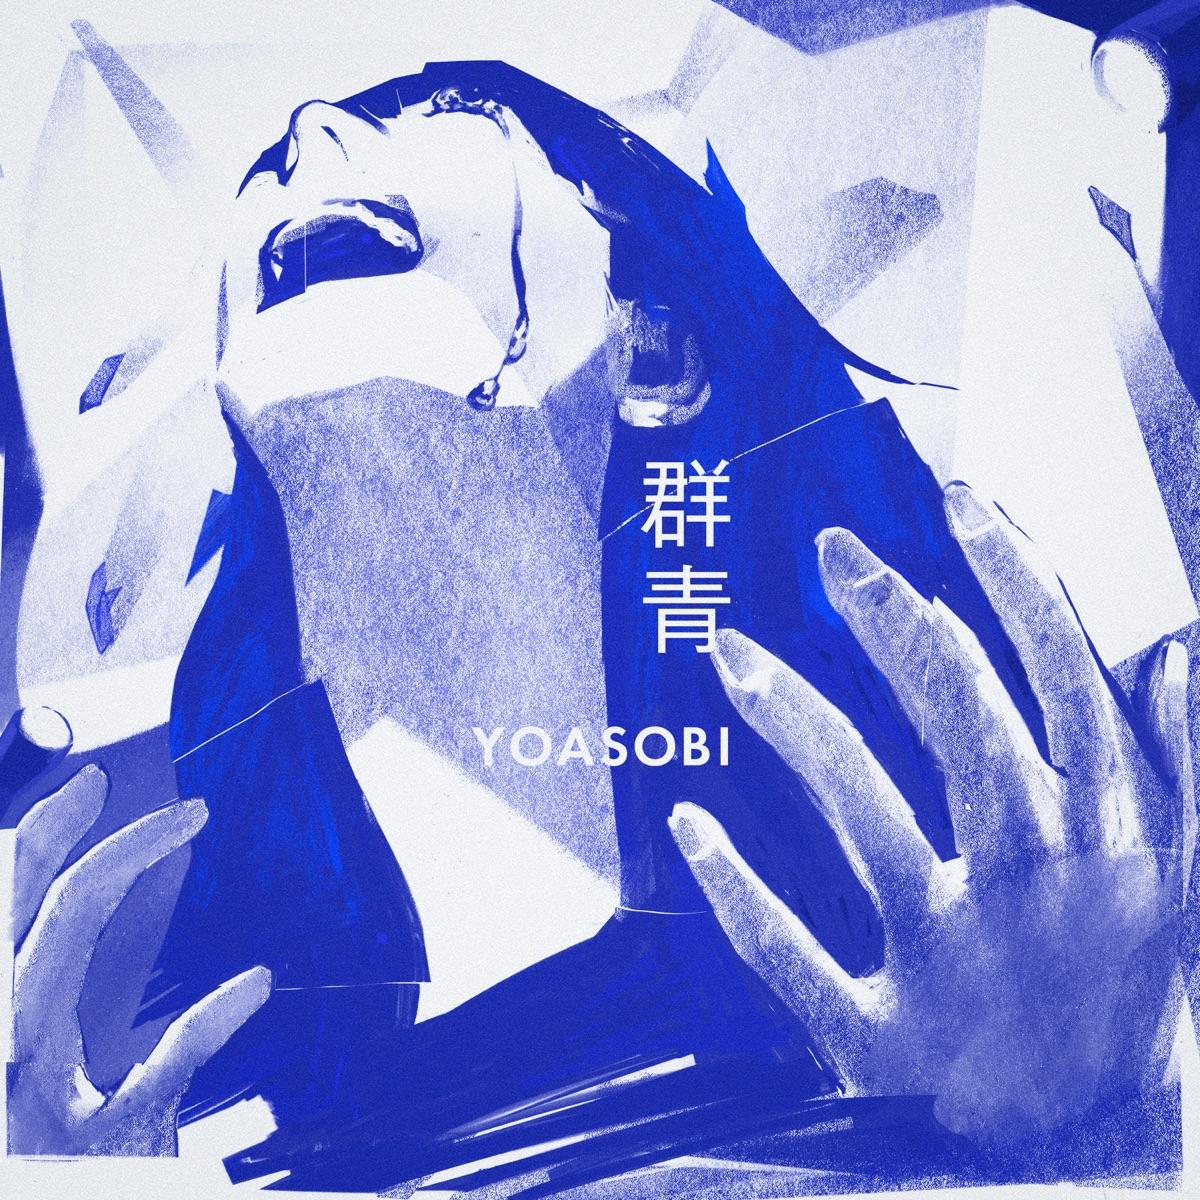 『YOASOBI 群青 歌詞』収録の『群青』ジャケット